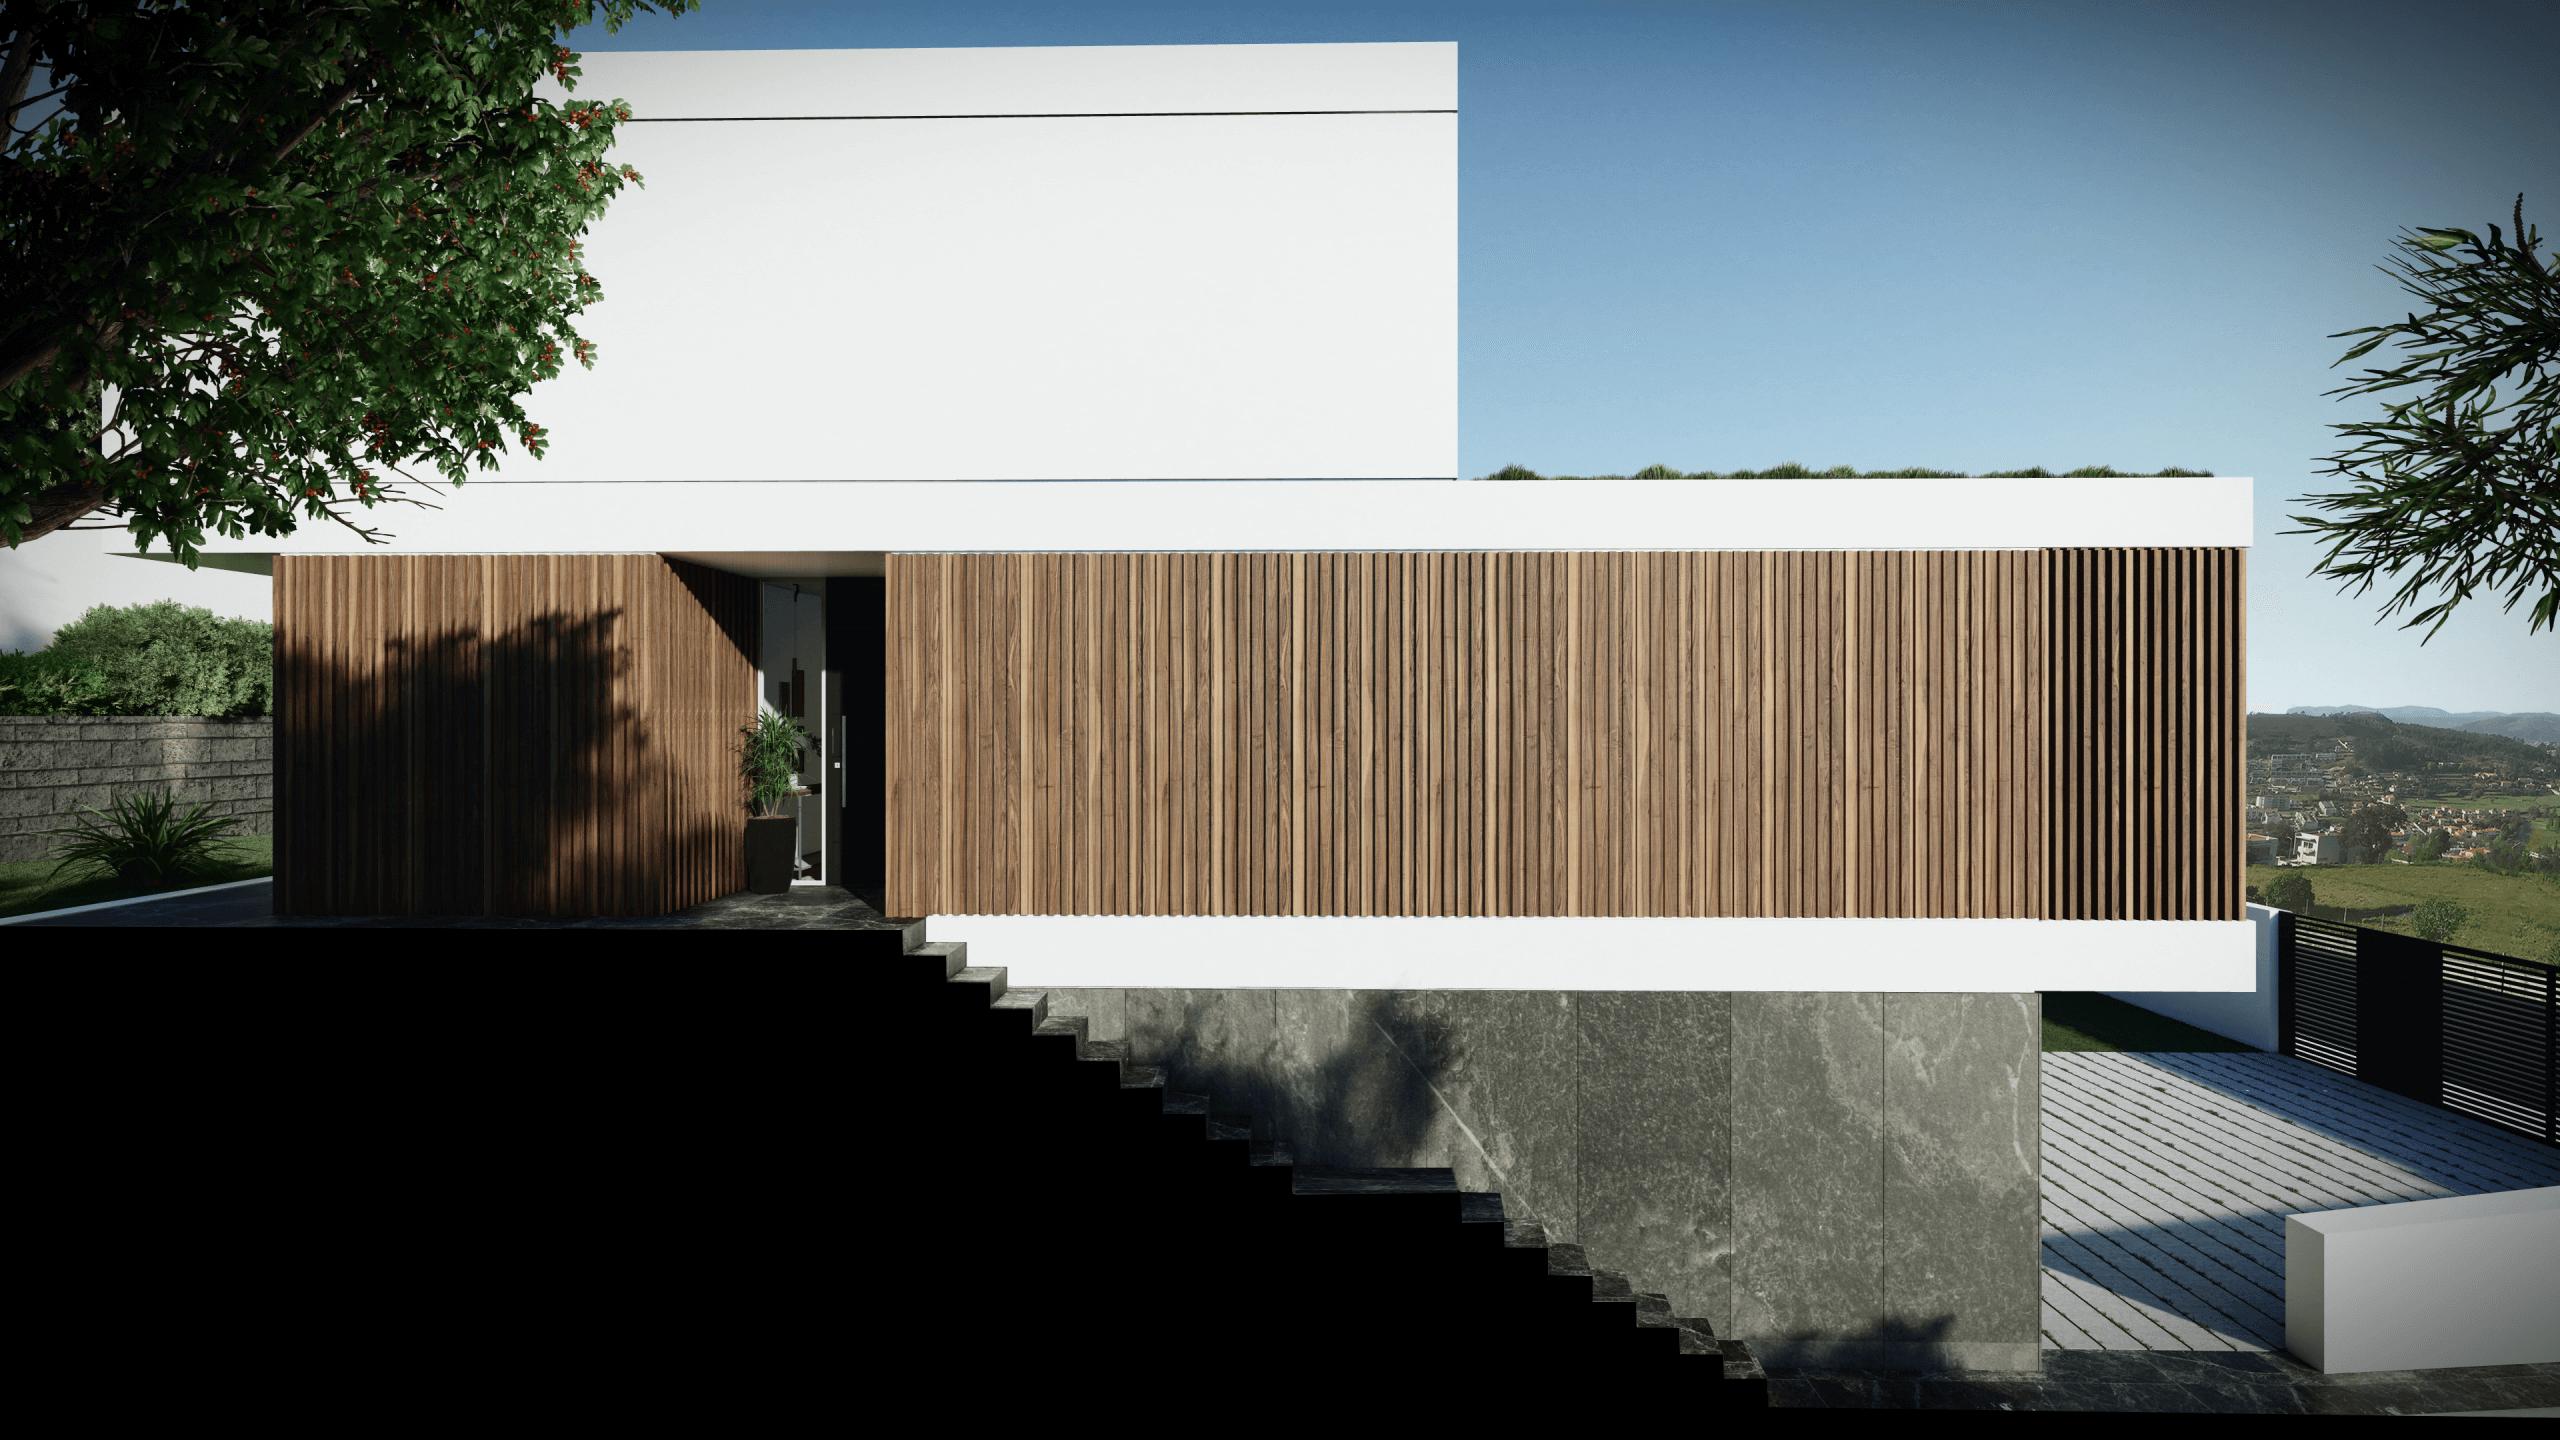 Gomes & Faria – arquitectos